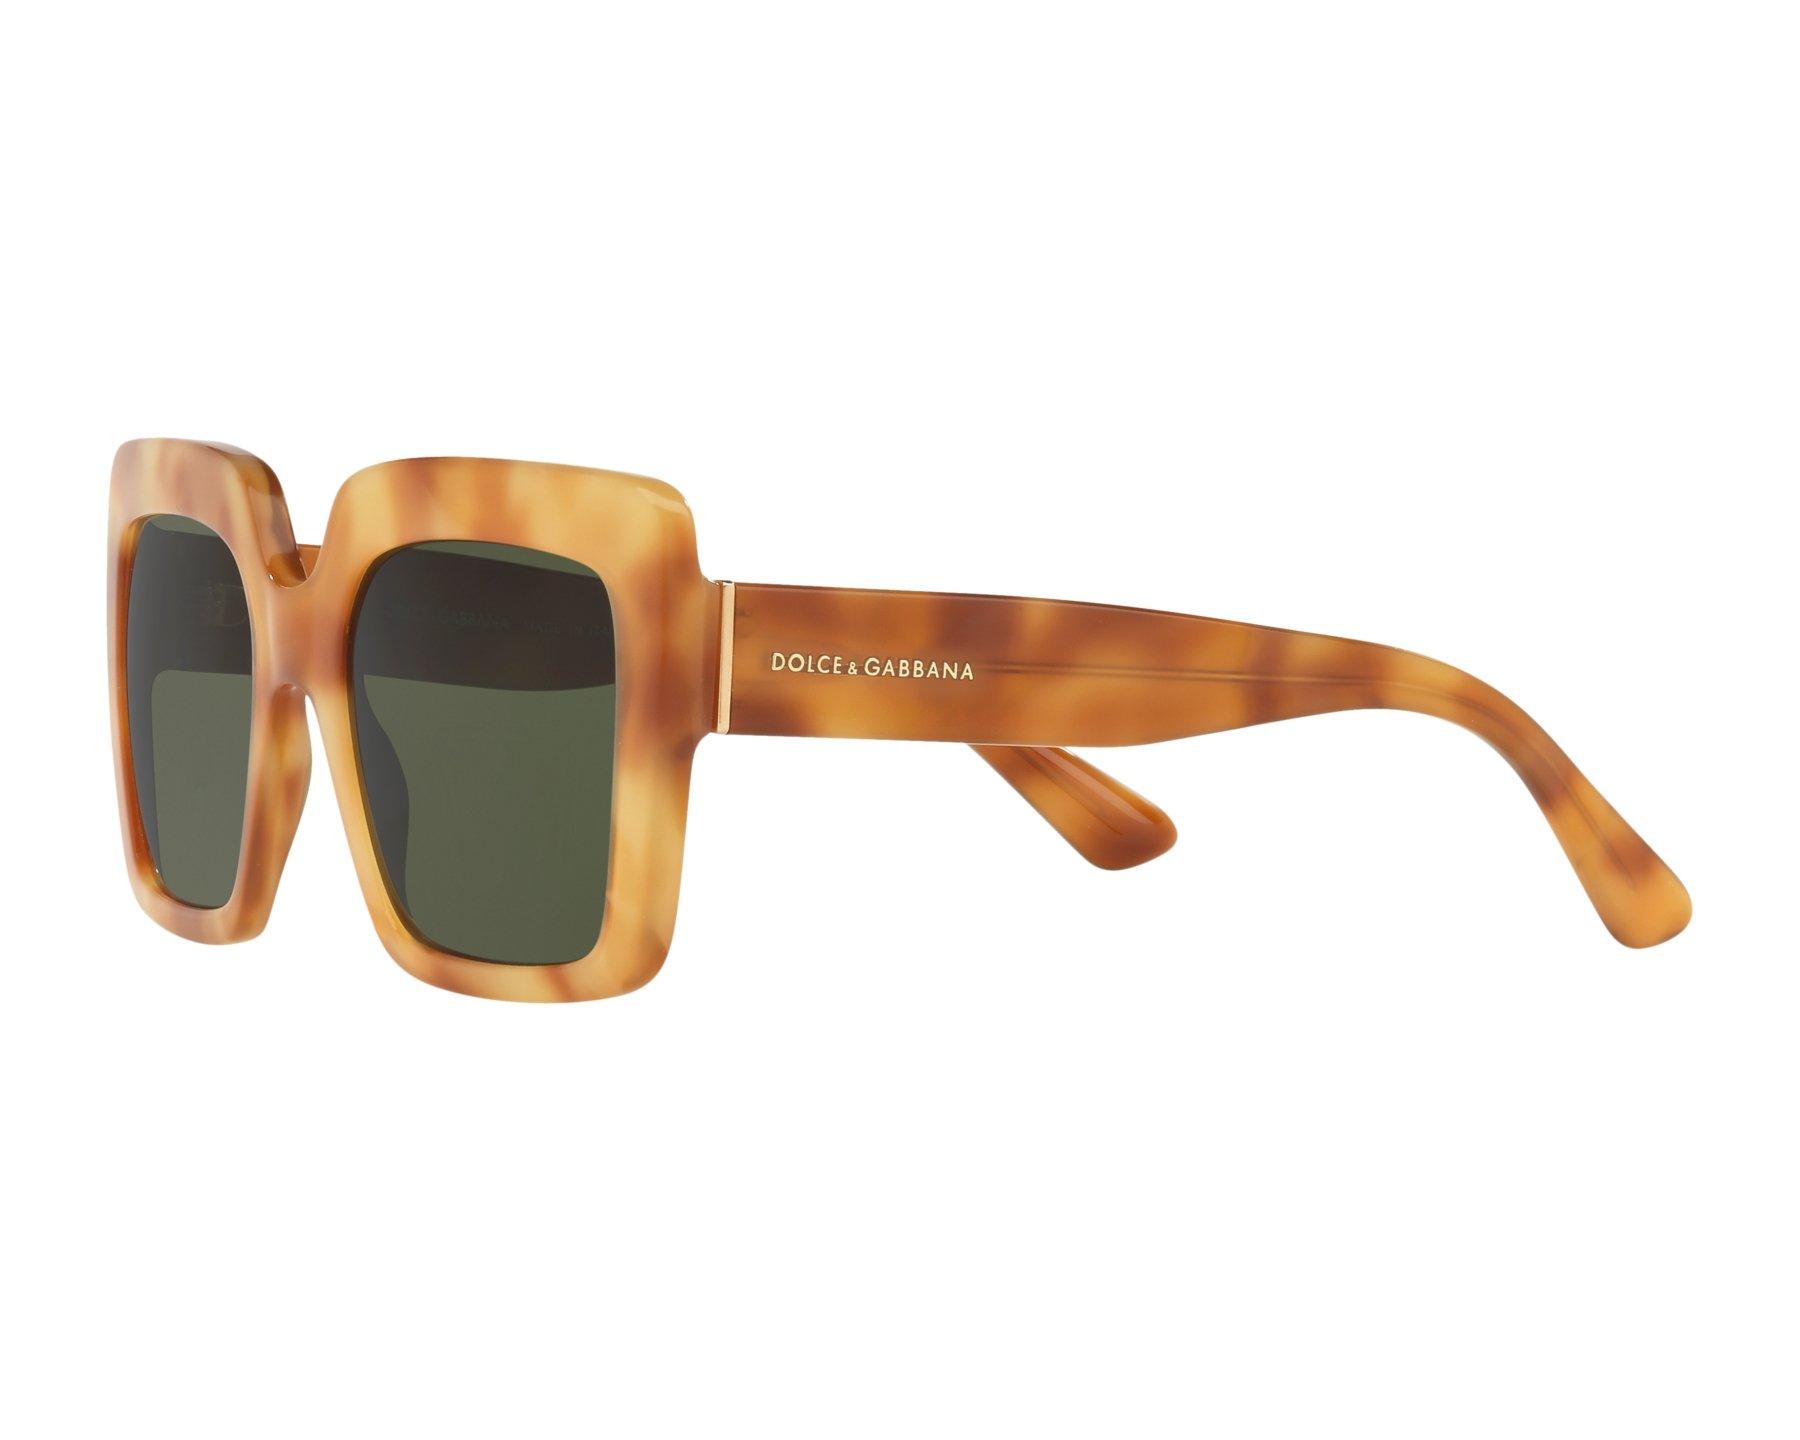 bf976053dcc Dolce Gabbana Sunglasses Dg 4310